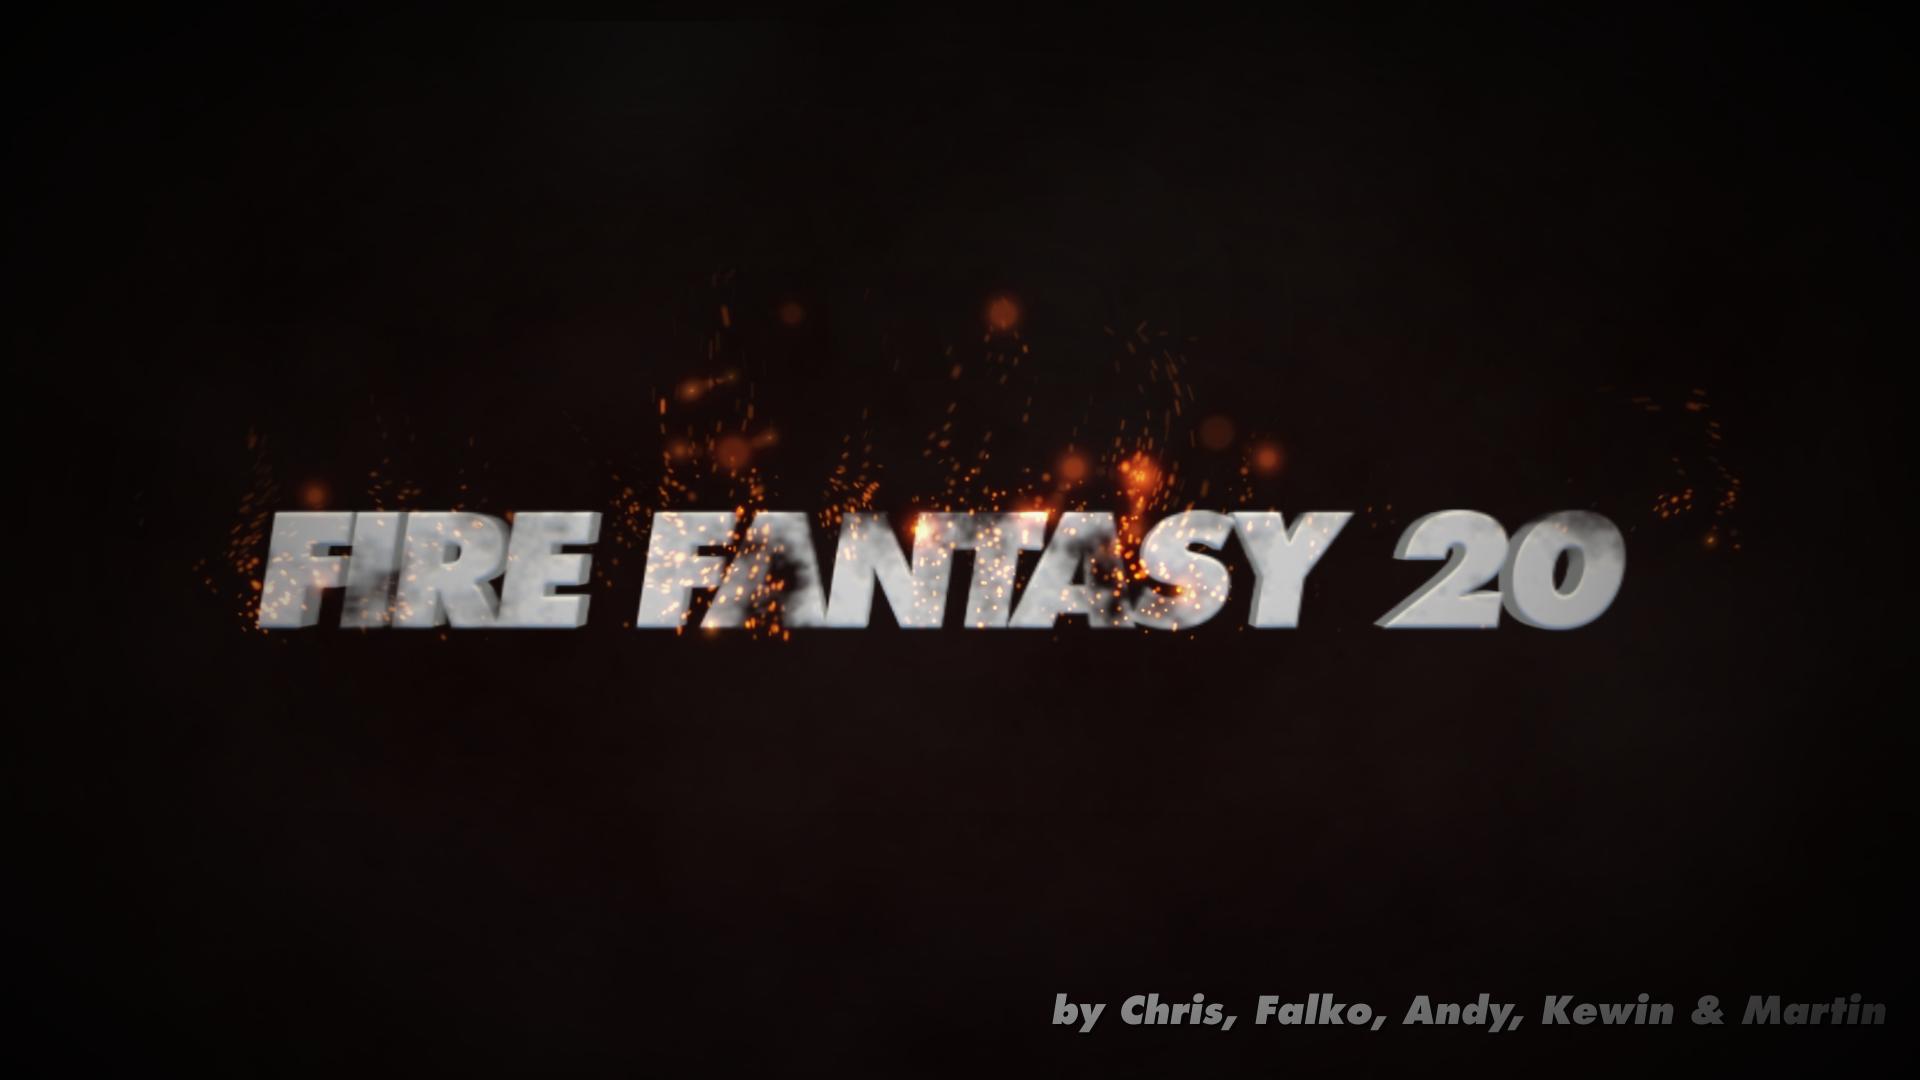 FIRE Fantasy 20 [Read the Manual]